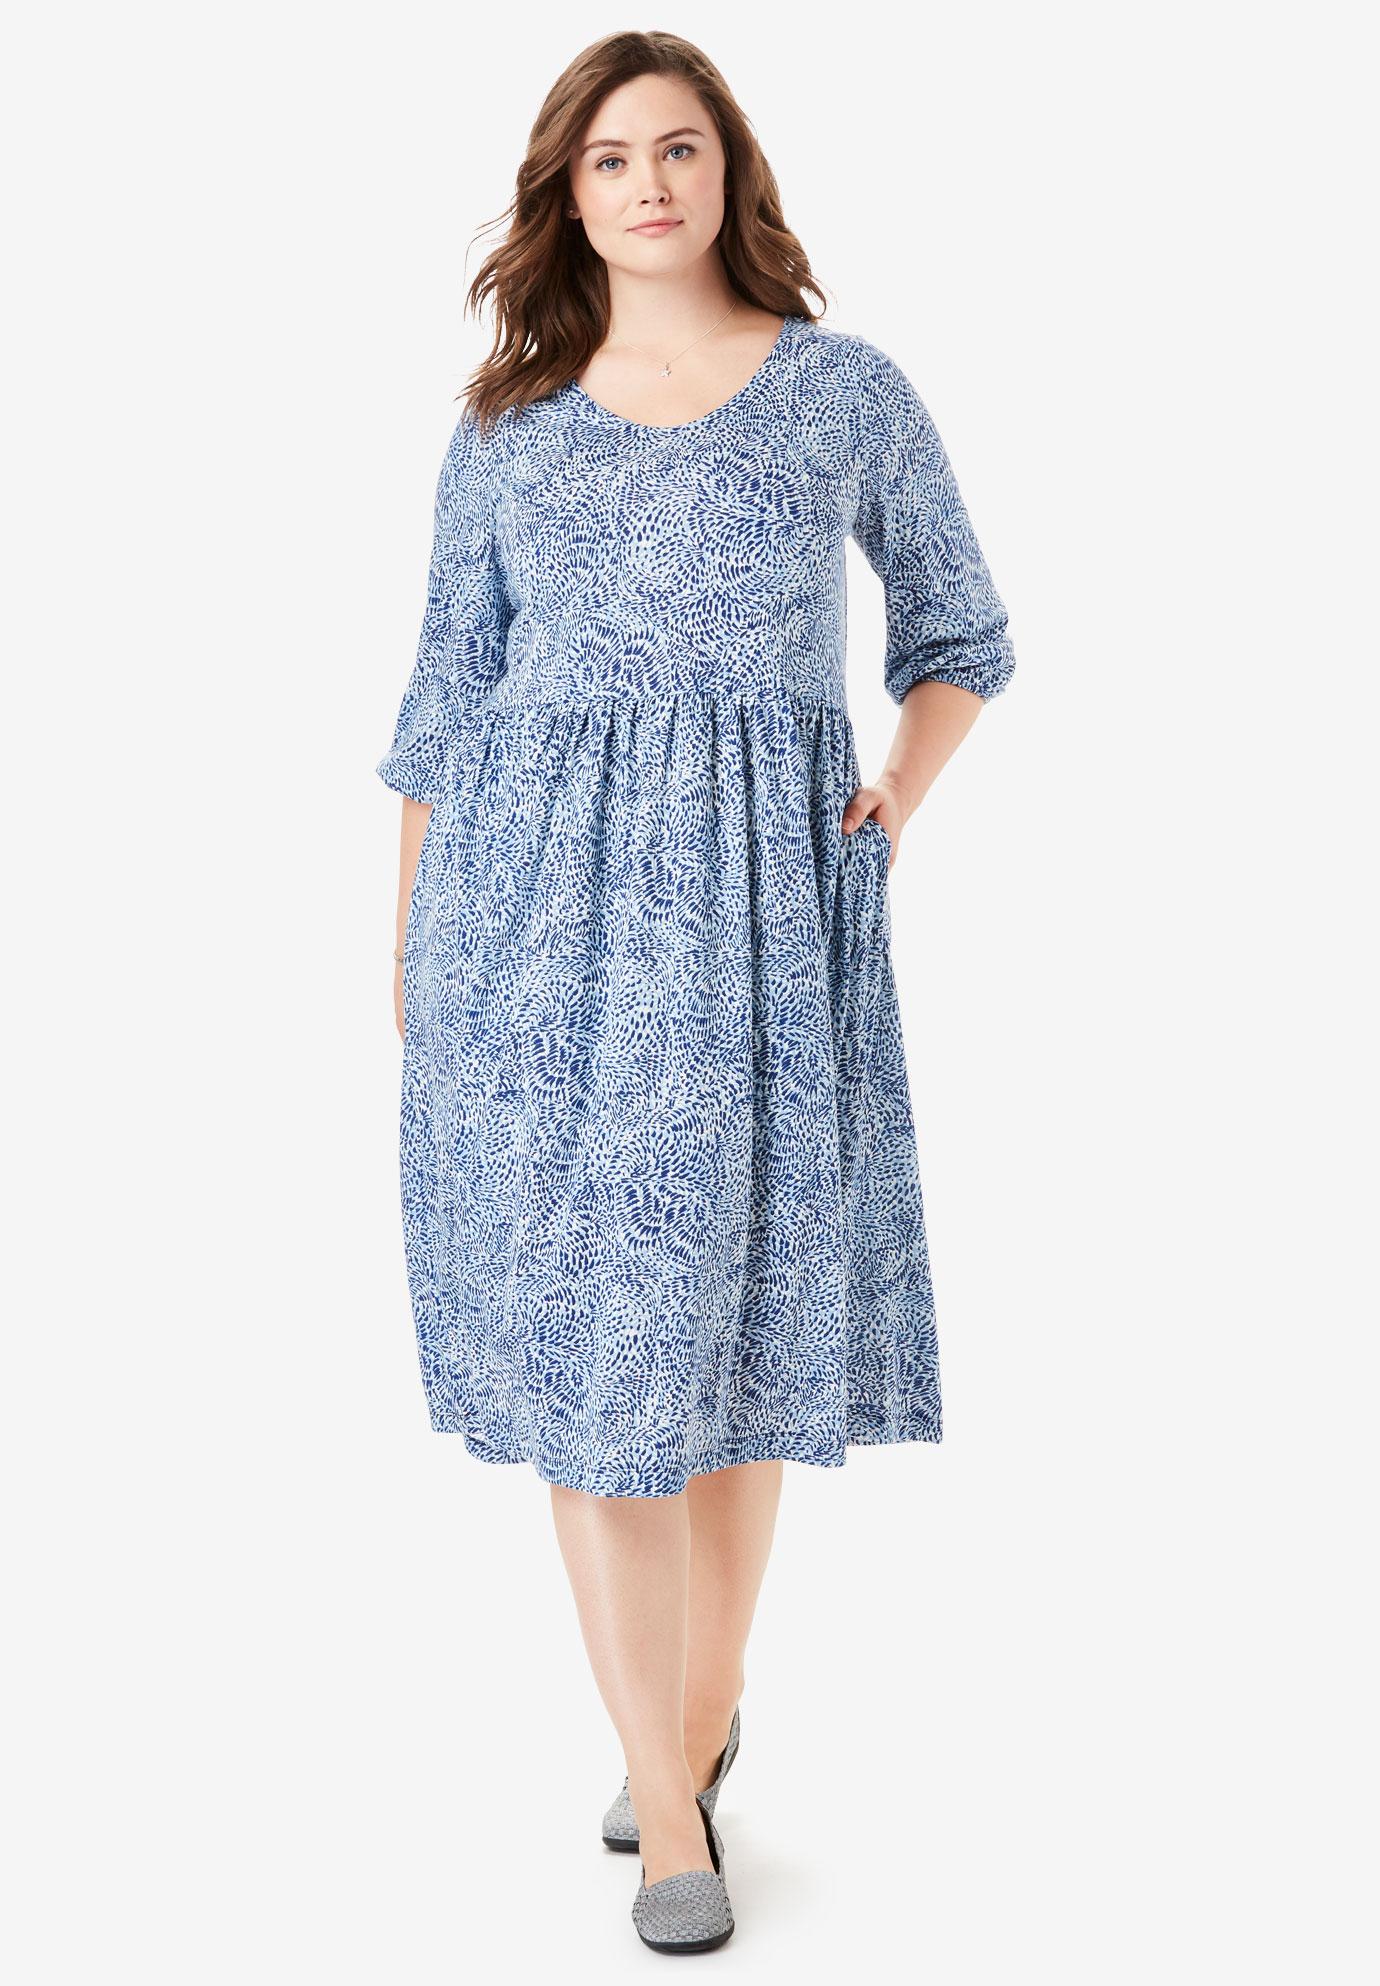 Empire Waist Dress| Plus Size Casual Dresses | Full Beauty